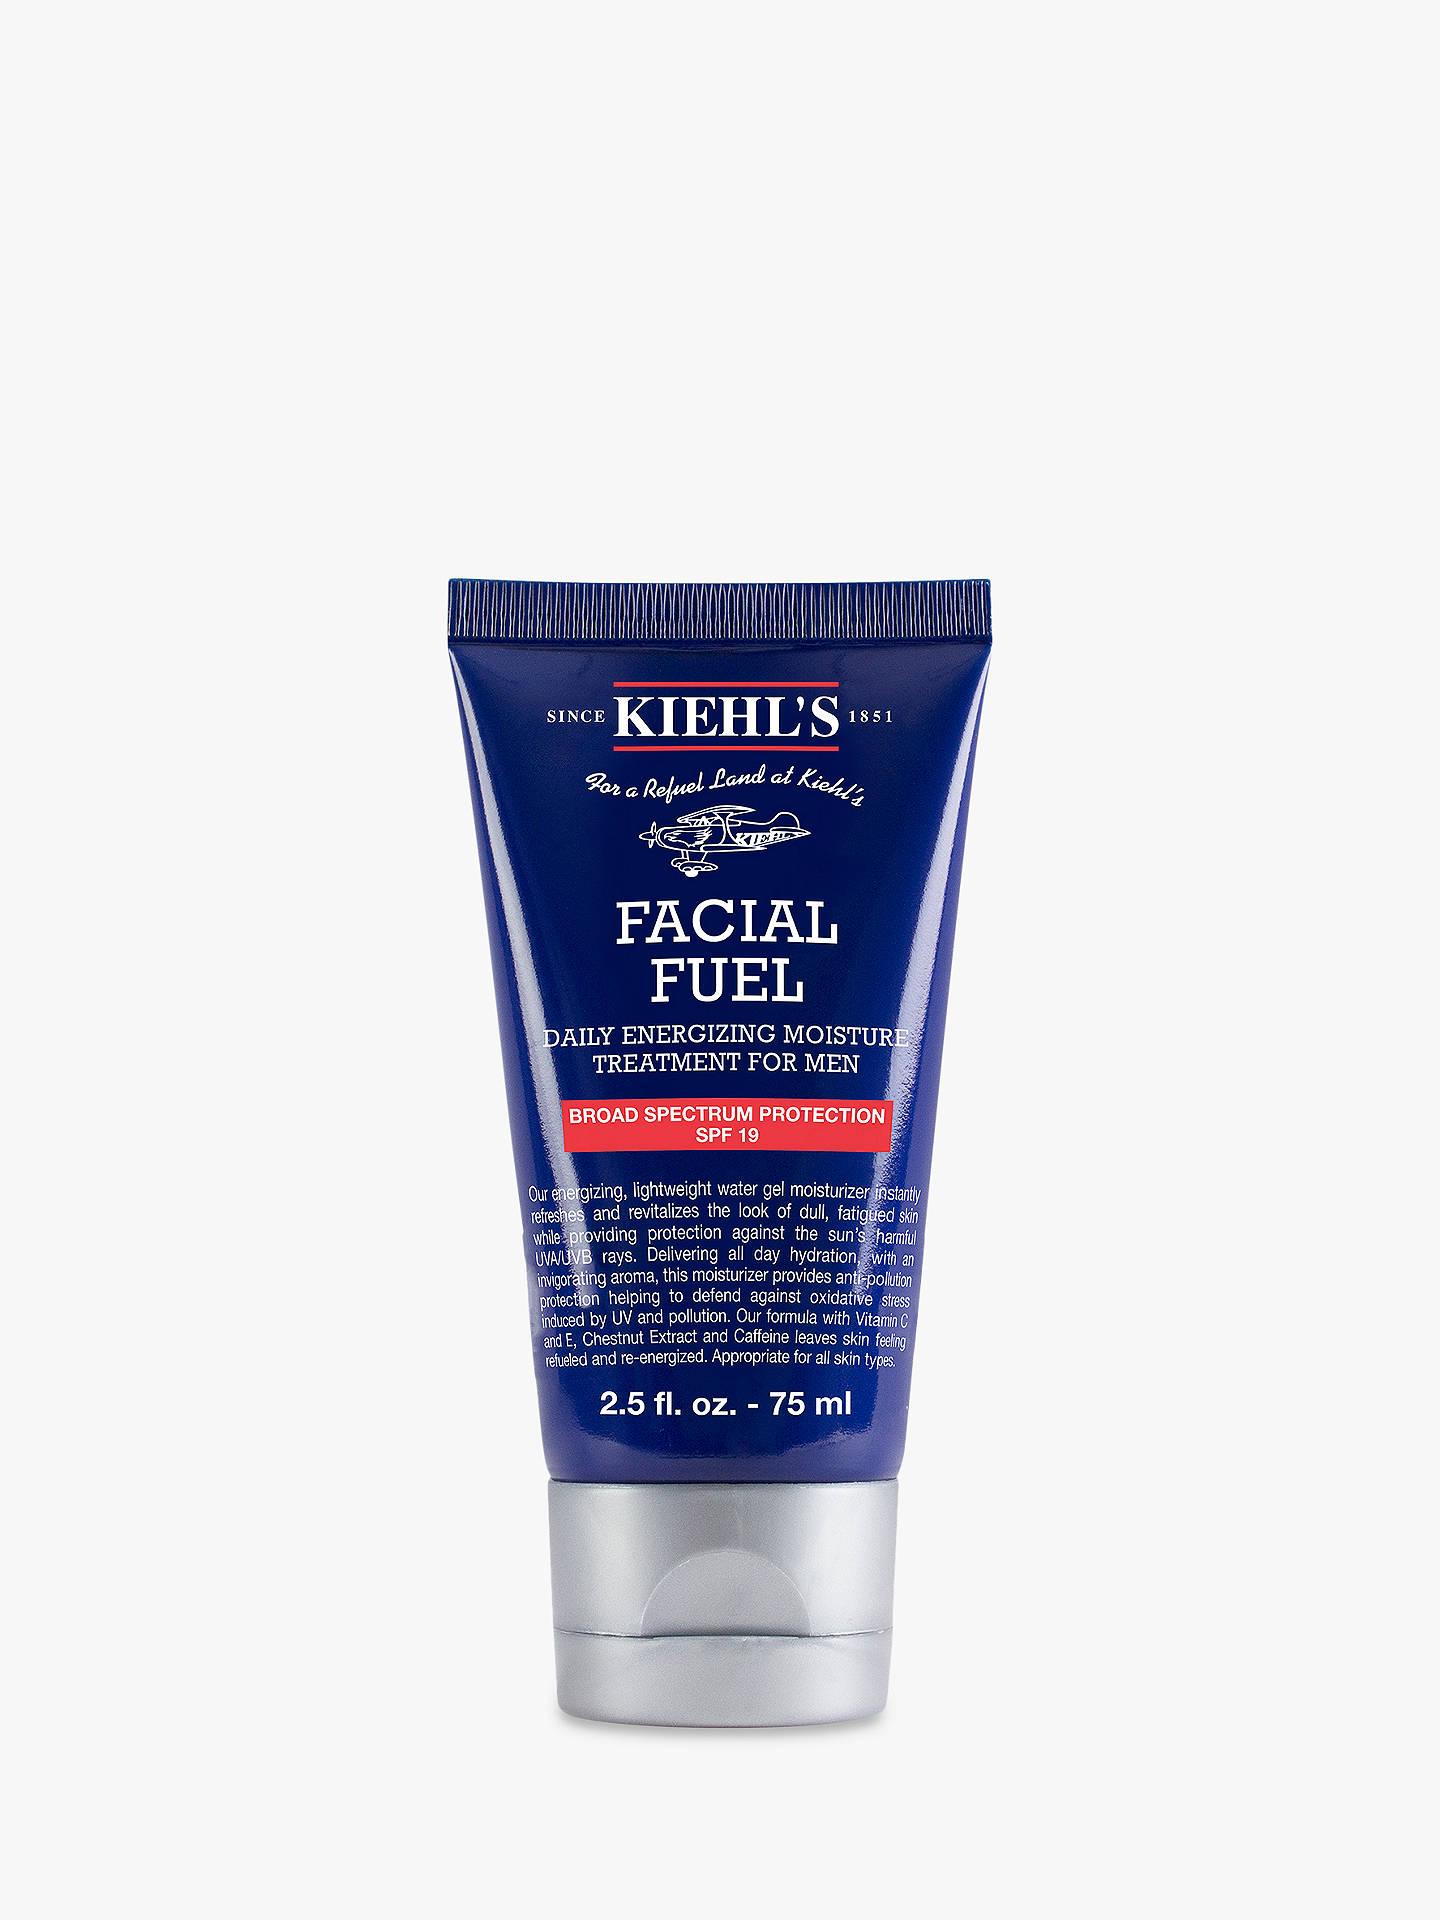 Kiehl's Facial Fuel Energizing Moisture Treatment For Men Spf 19 by Kiehl's